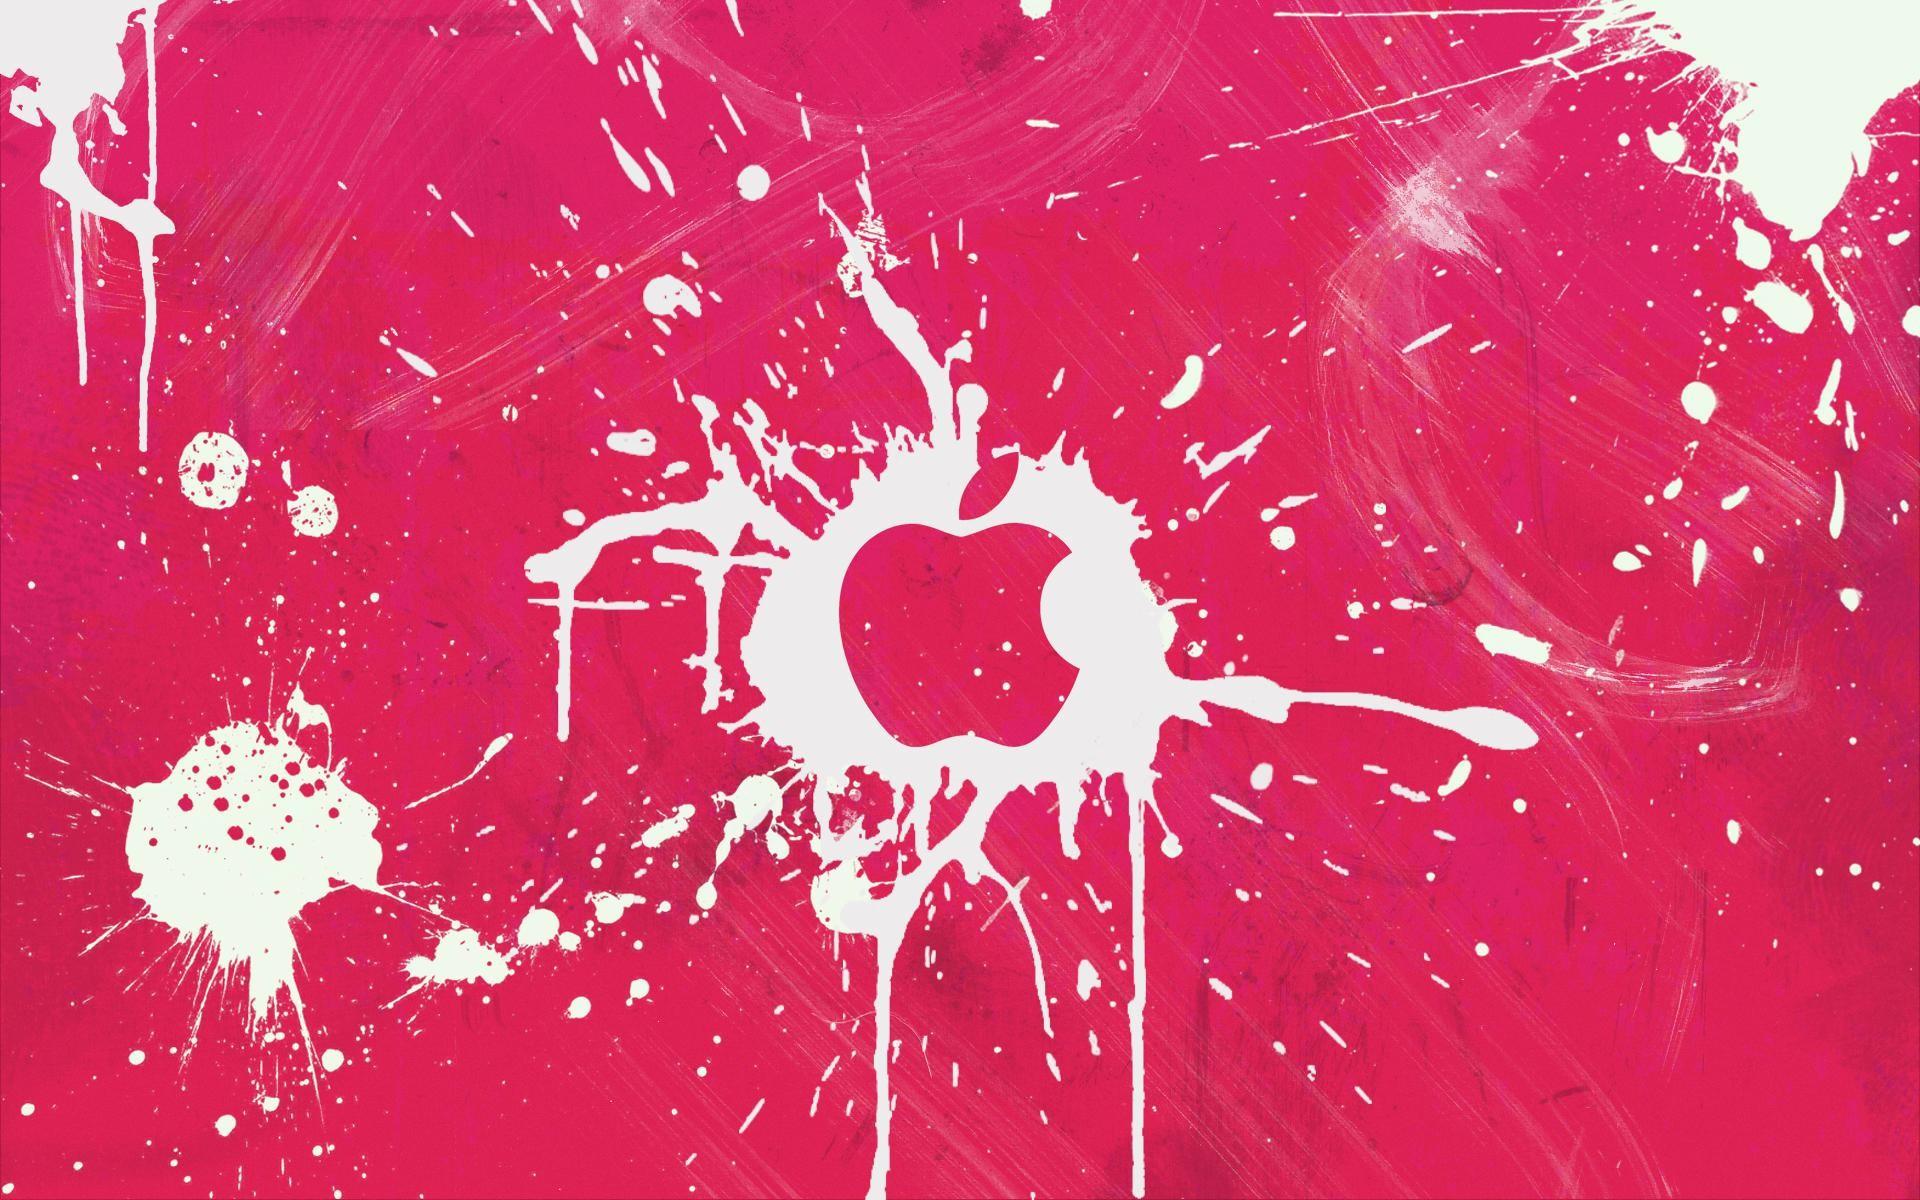 apple logo brand desktop wallpaper hd